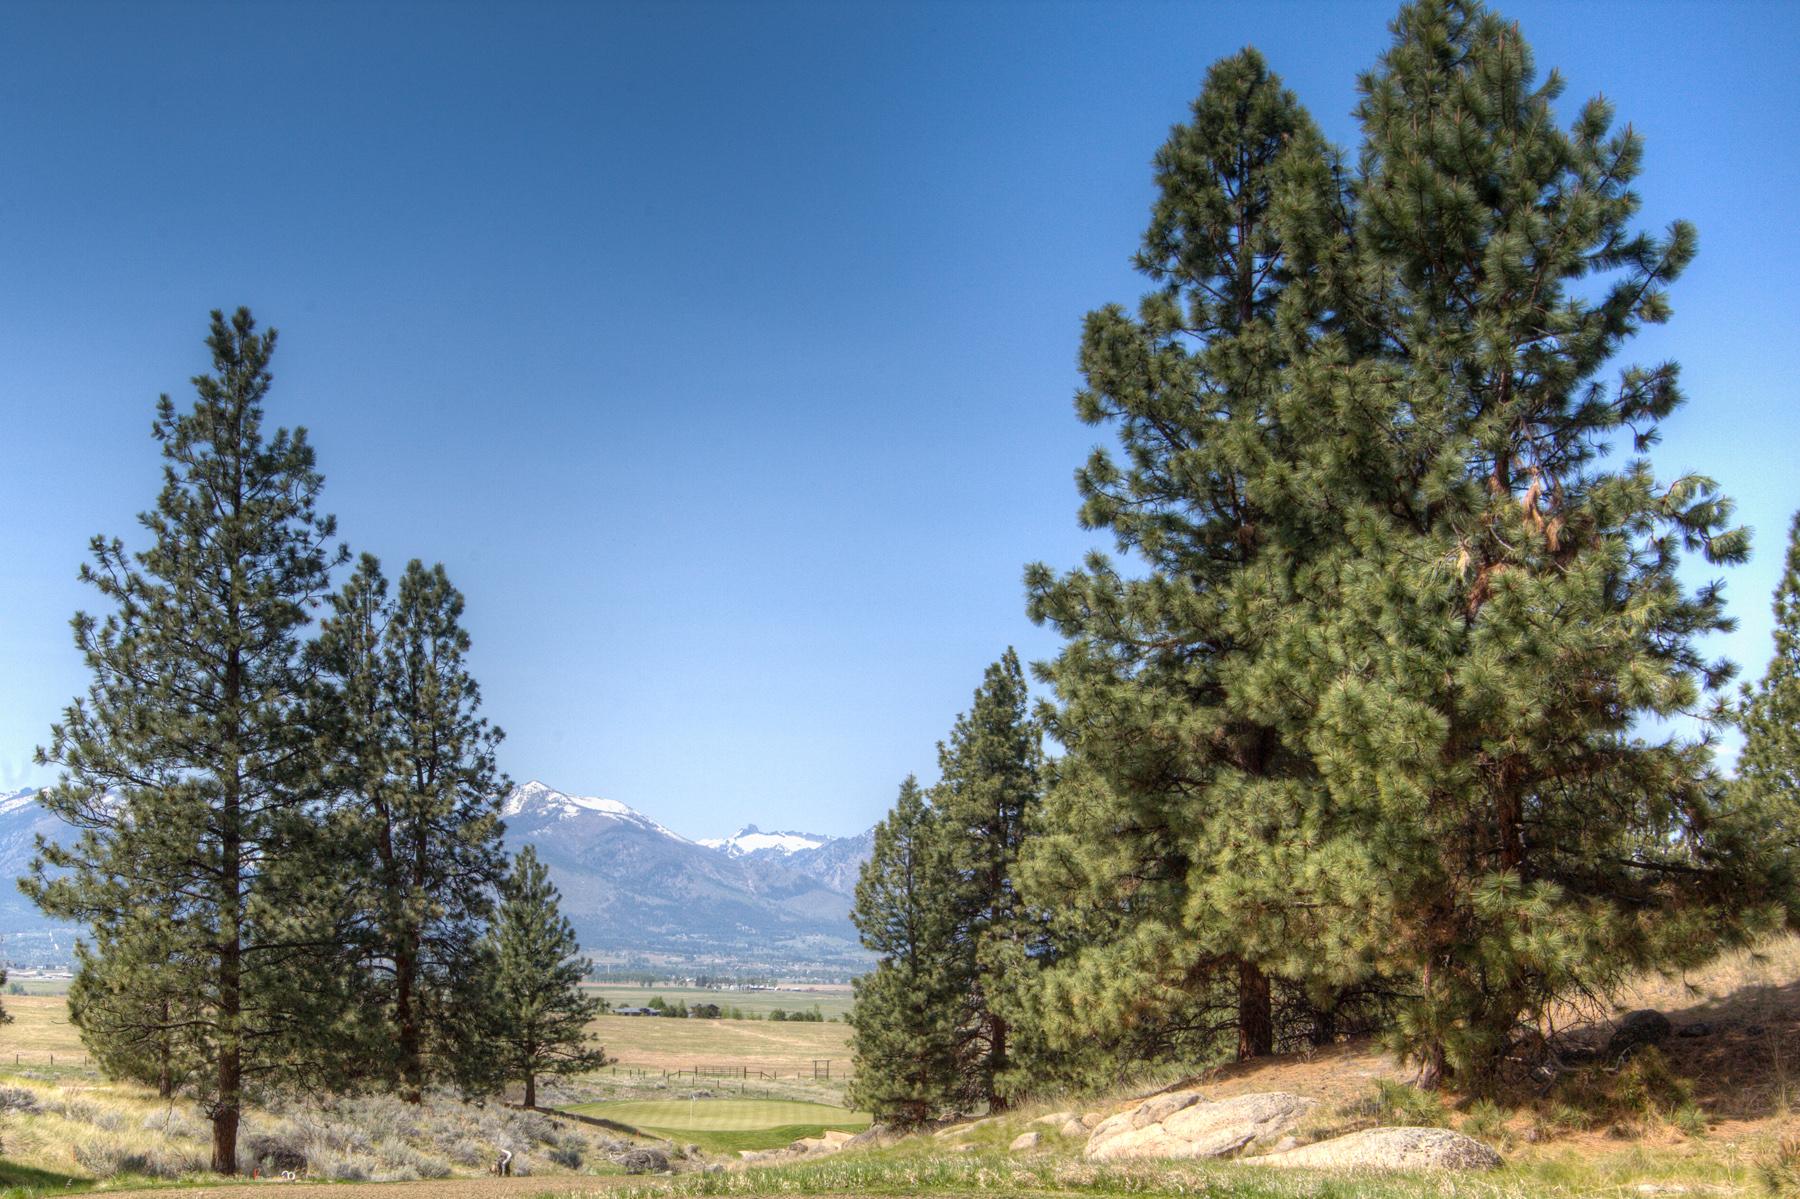 Land for Sale at Lot 66 Stock Farm Lot 66 Stock Farm Rd Hamilton, Montana 59840 United States